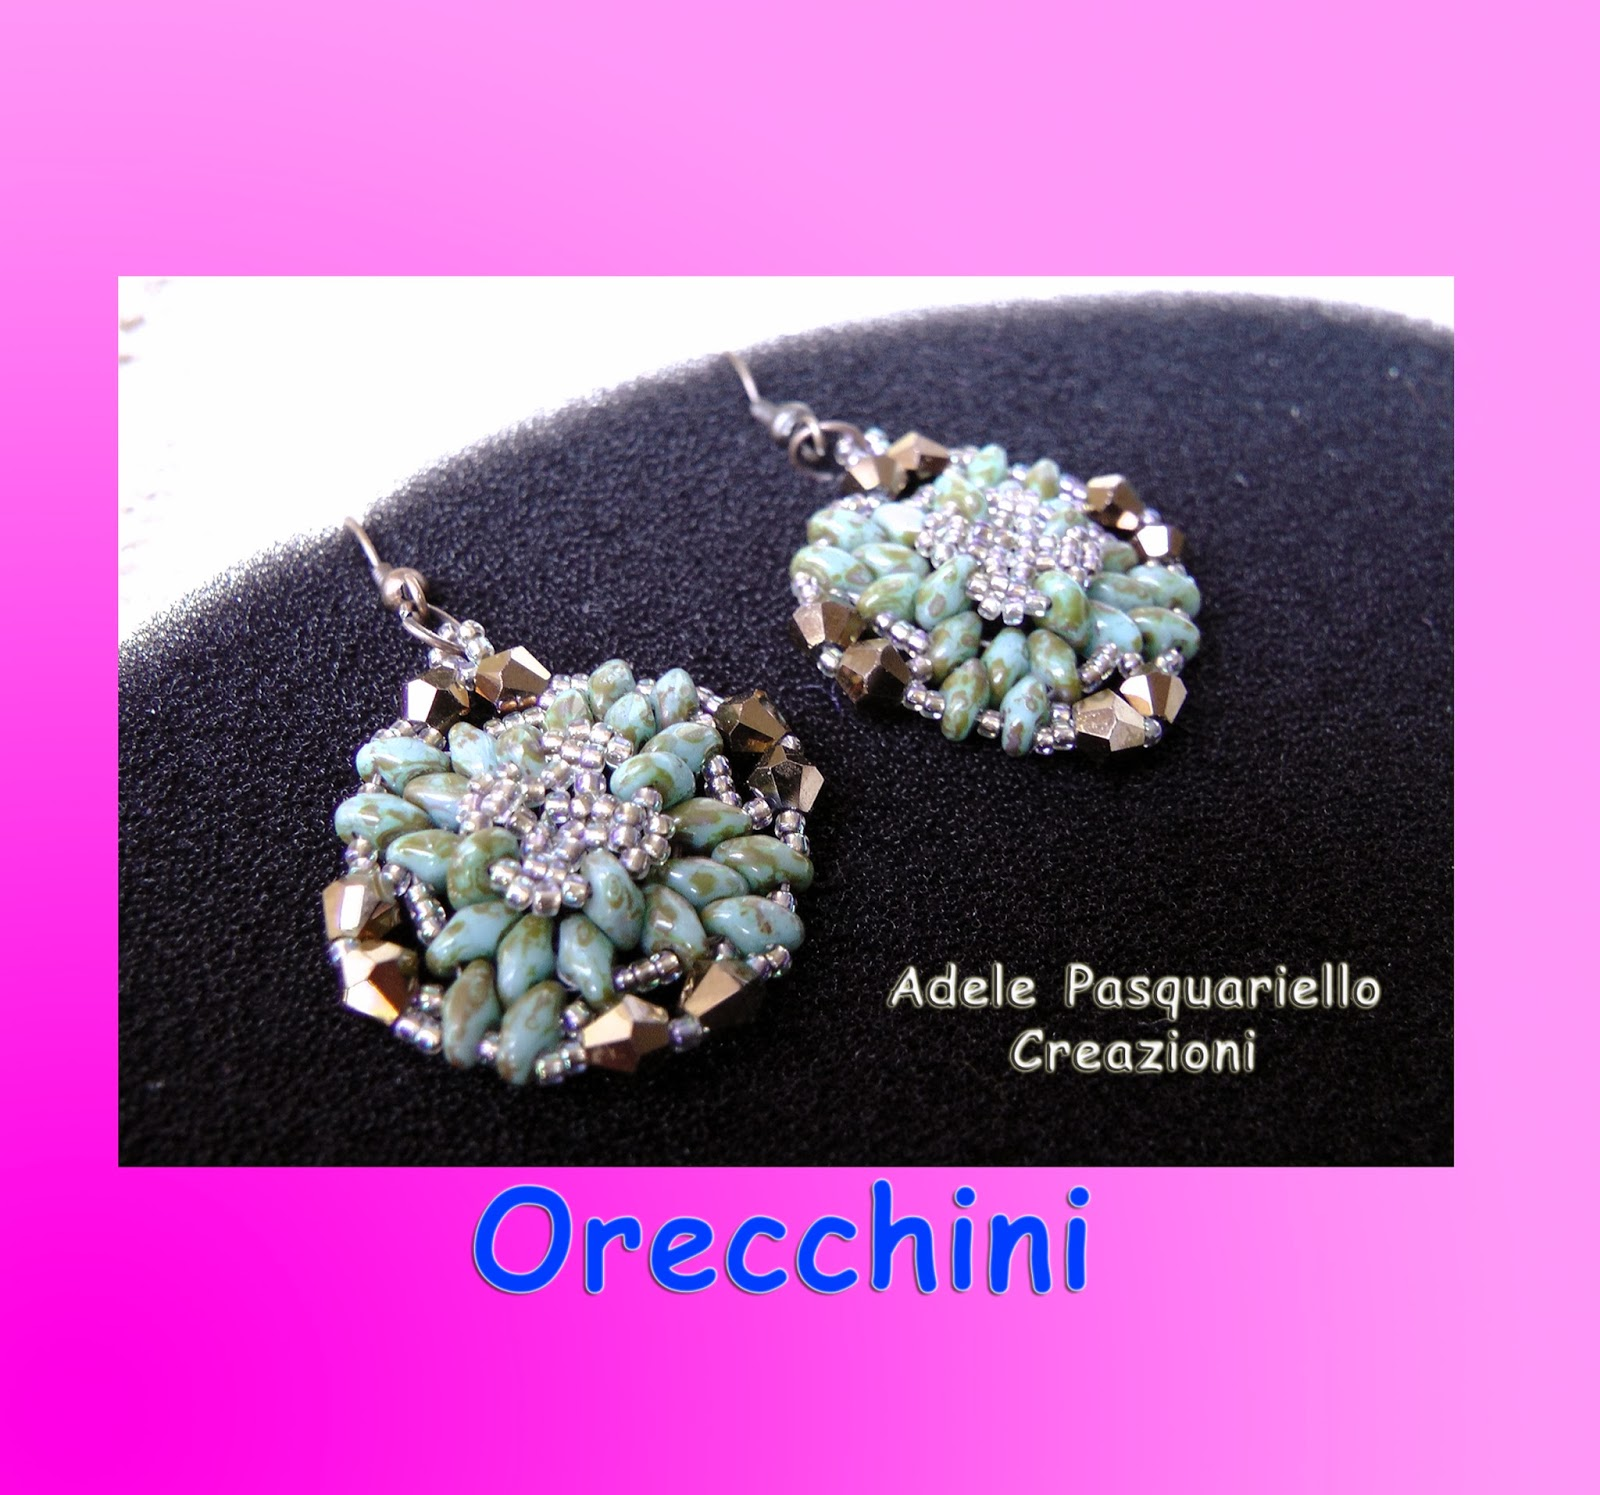 http://adelepasquariello.blogspot.it/2014/02/orecchini.html